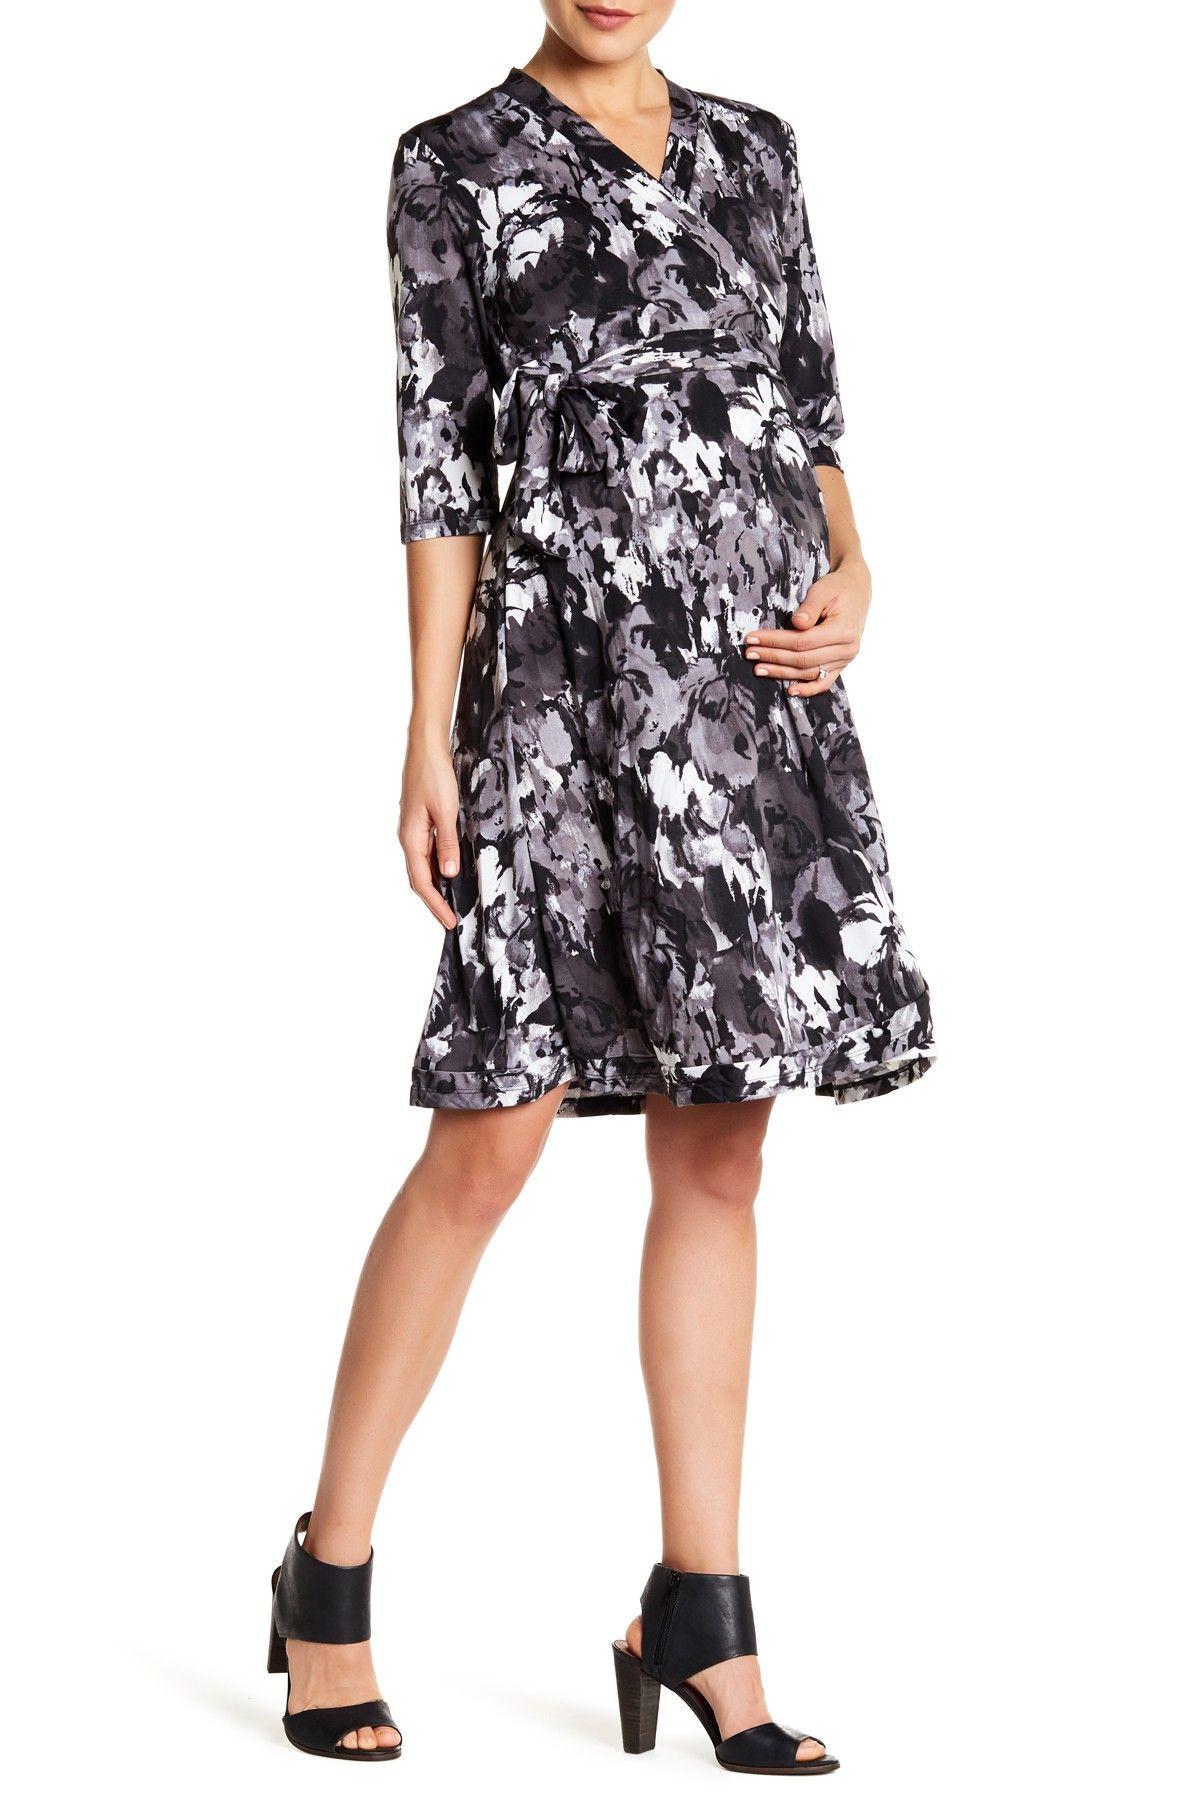 Everly Grey Maternity Mila Nursing Wrap Dress Maternity Wrap Dress Dresses Maternity Dresses [ 1800 x 1200 Pixel ]